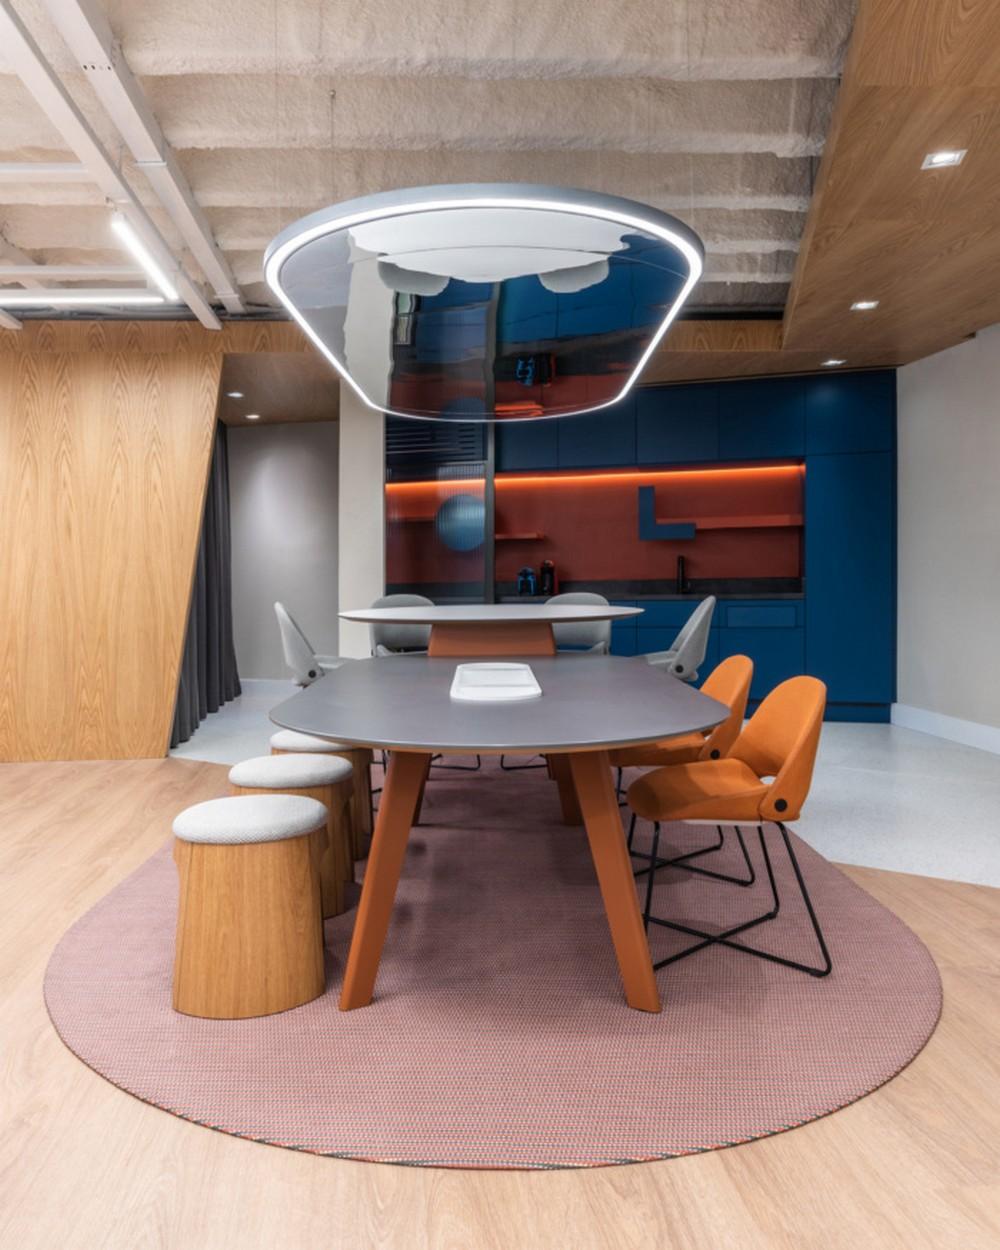 best interior design showrooms in são paulo Best Interior Design Showrooms in São Paulo ricco offices sao paulo 10 700x875 1